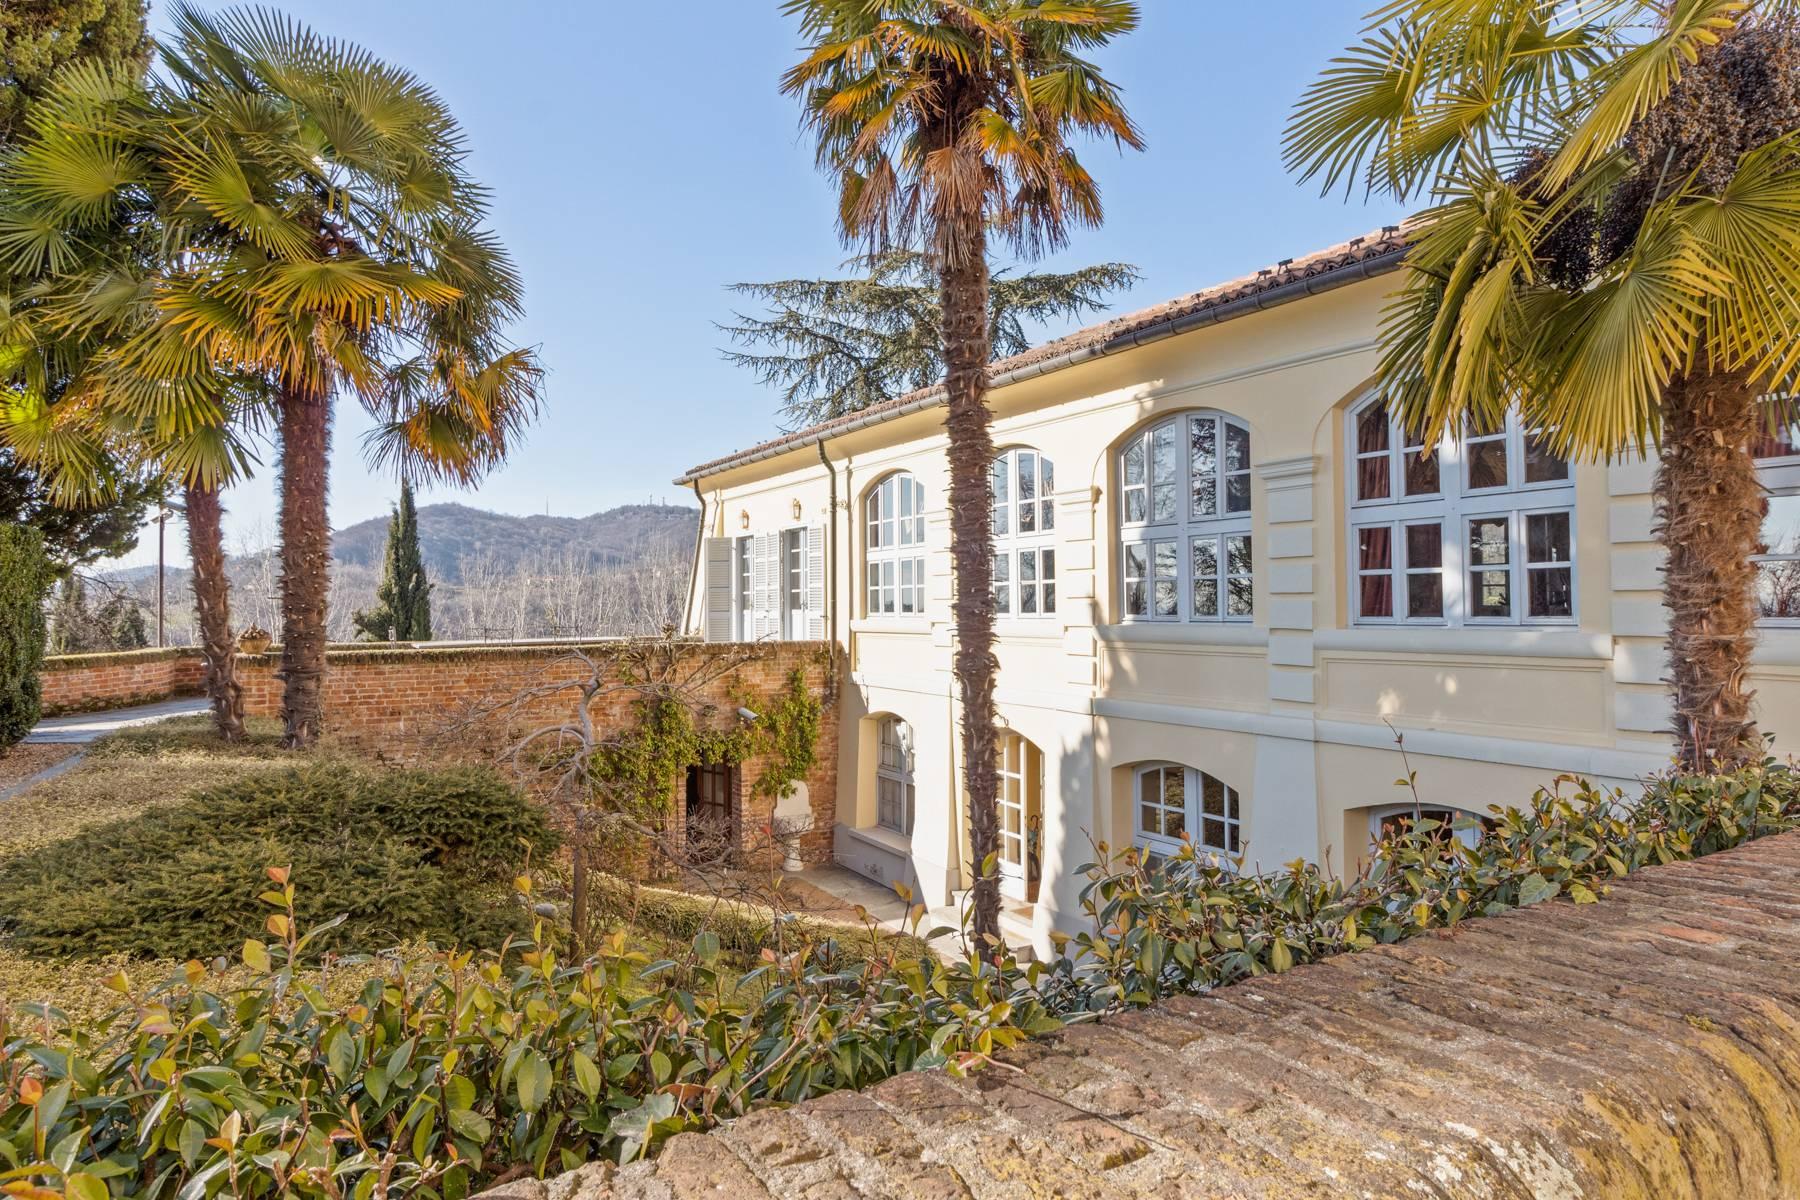 Villa in Vendita a Pino Torinese: 5 locali, 2087 mq - Foto 16